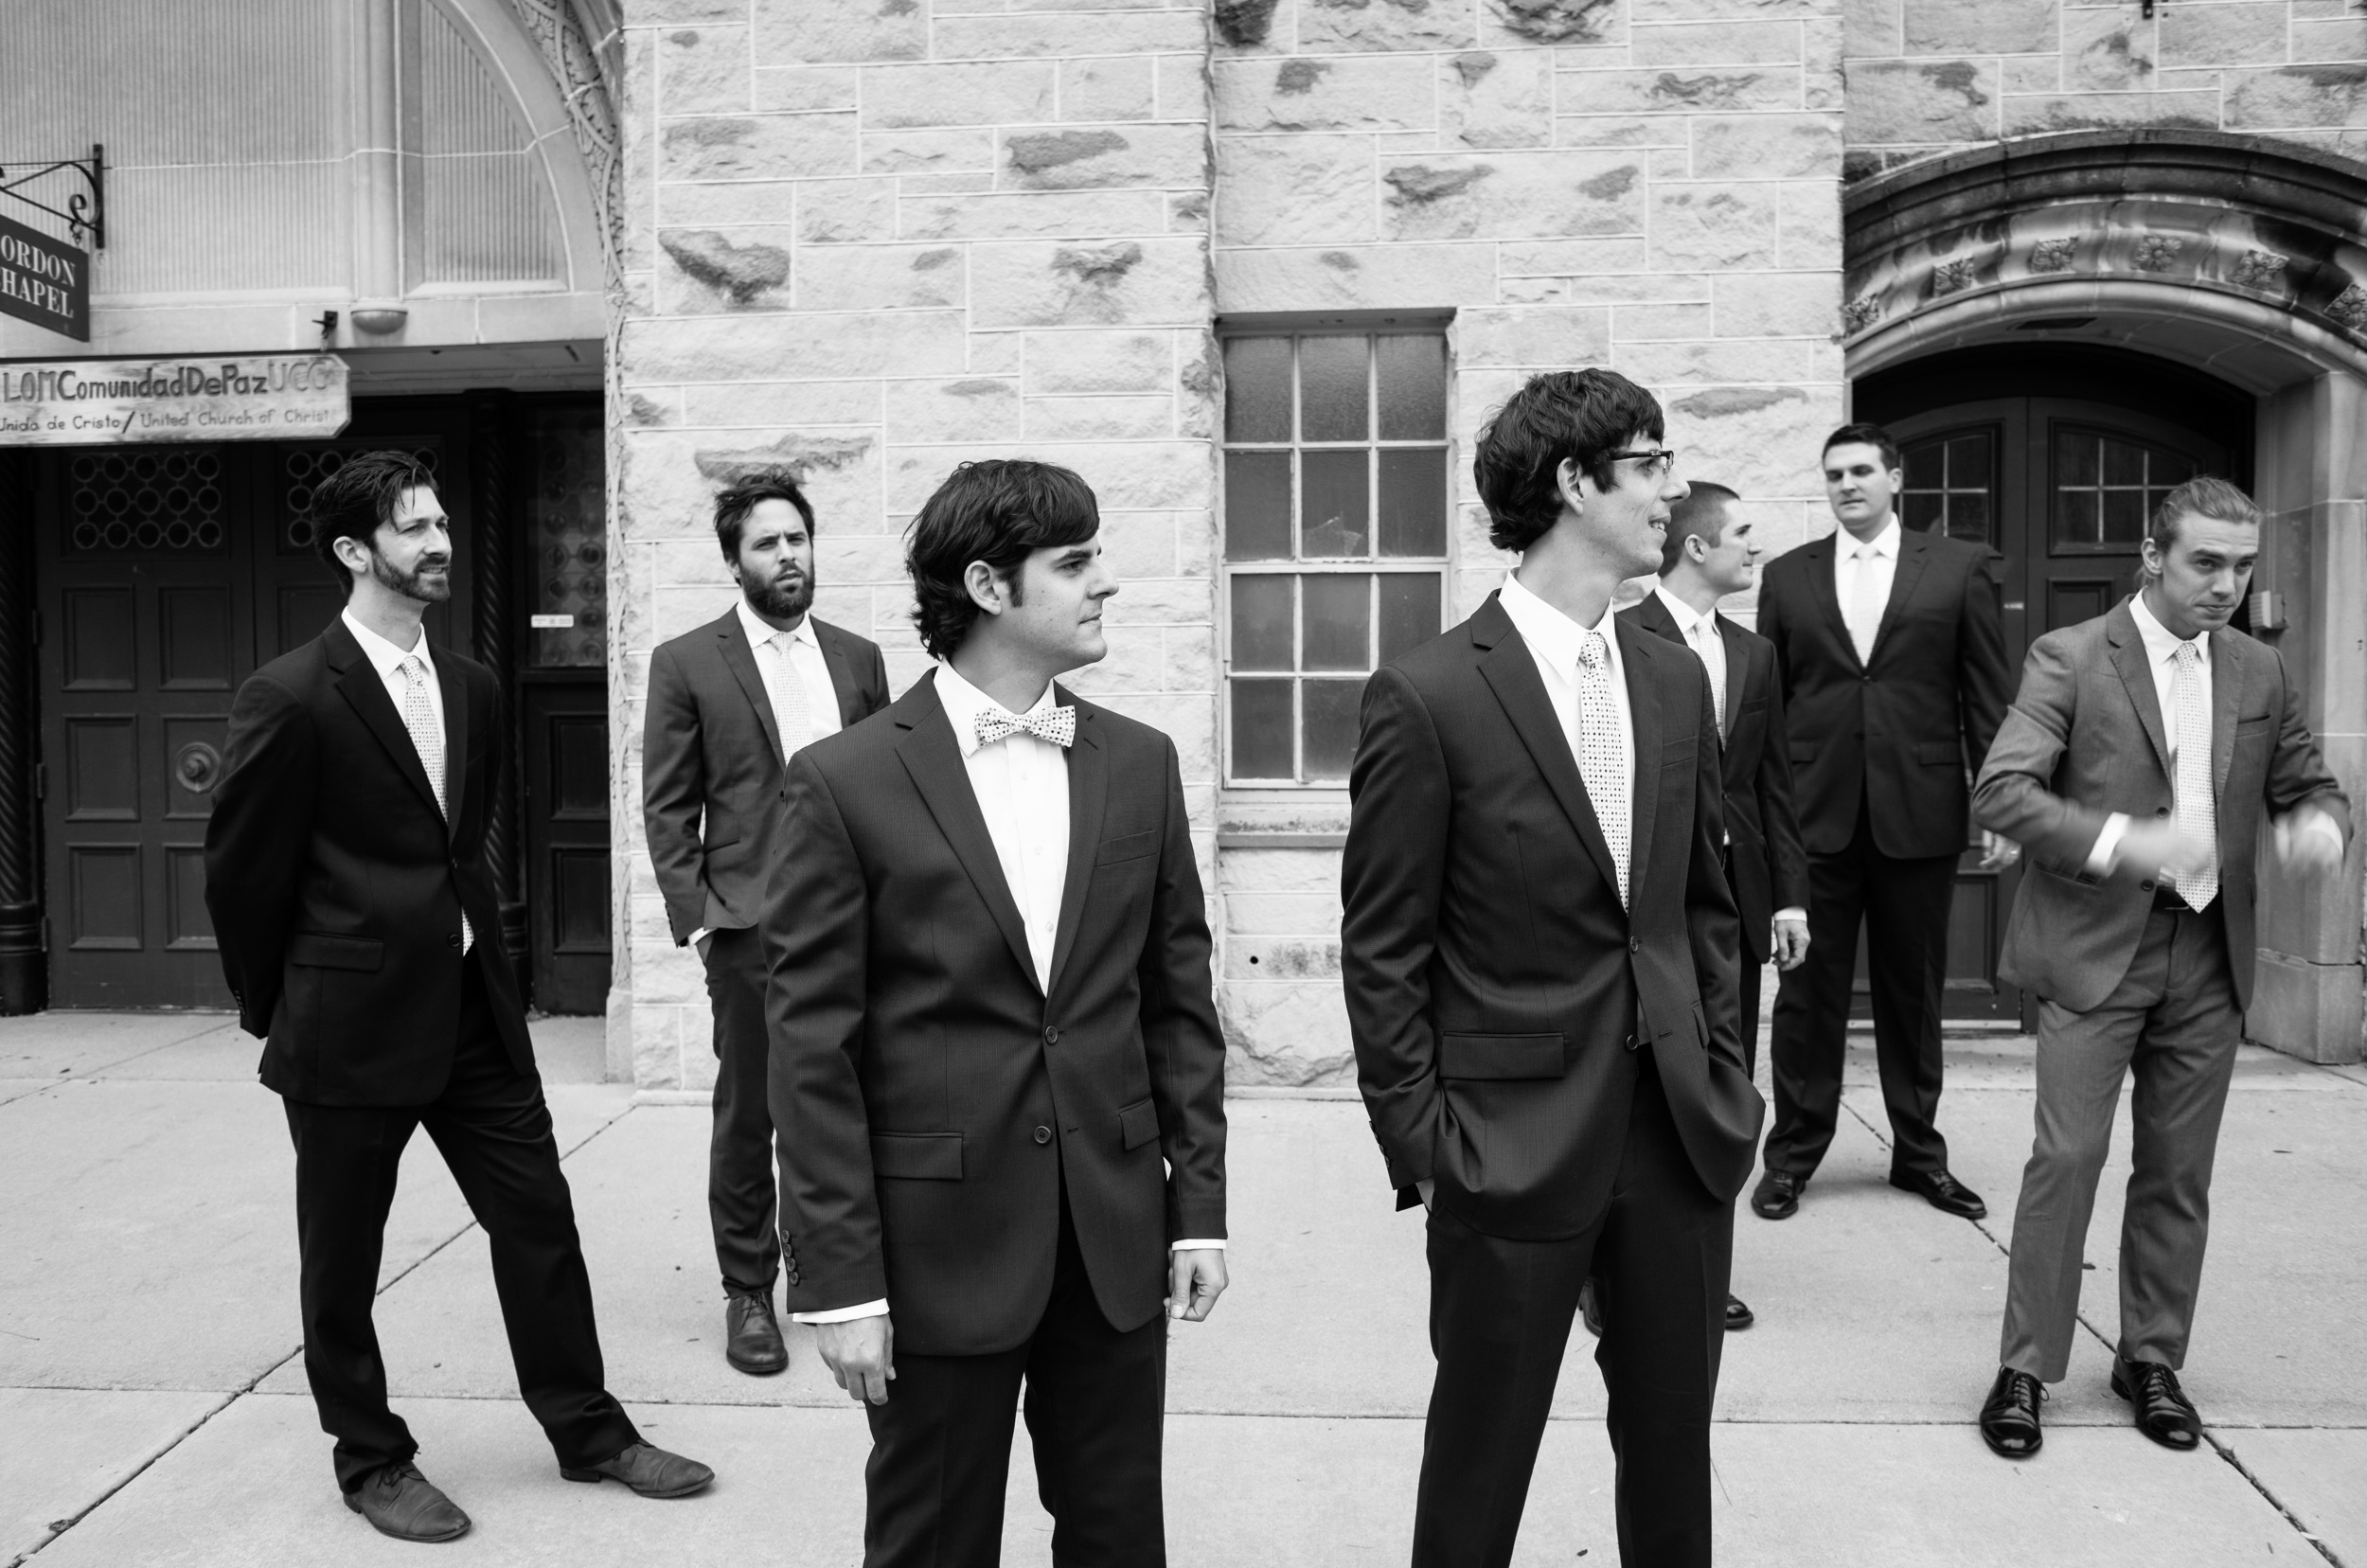 10-05-2013 maggie & adam wedding photography by brian milo-118.jpg